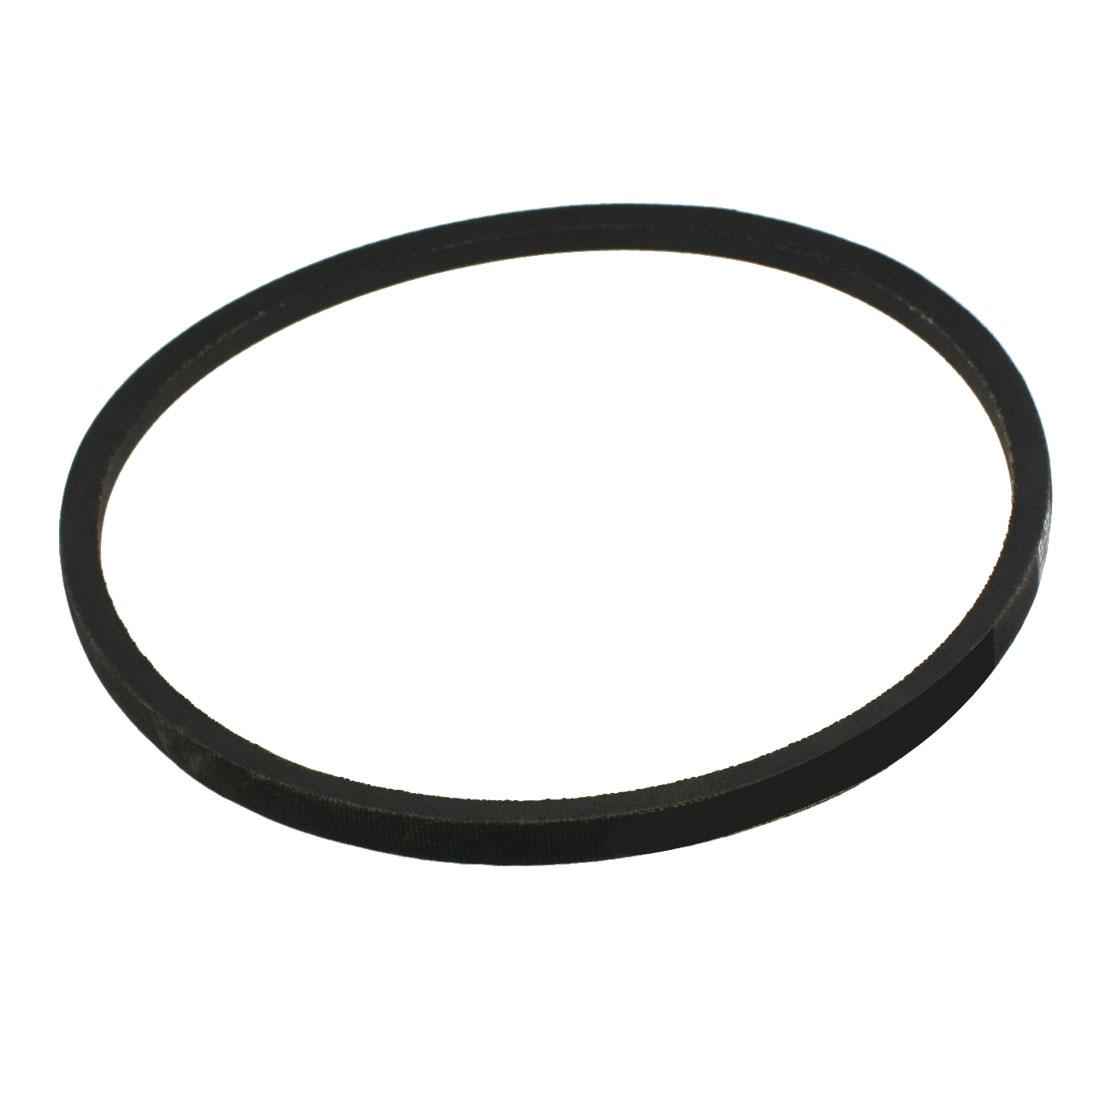 Machinery Drive Band Black Rubber B Type Vee V Belt 16mm x 850mm